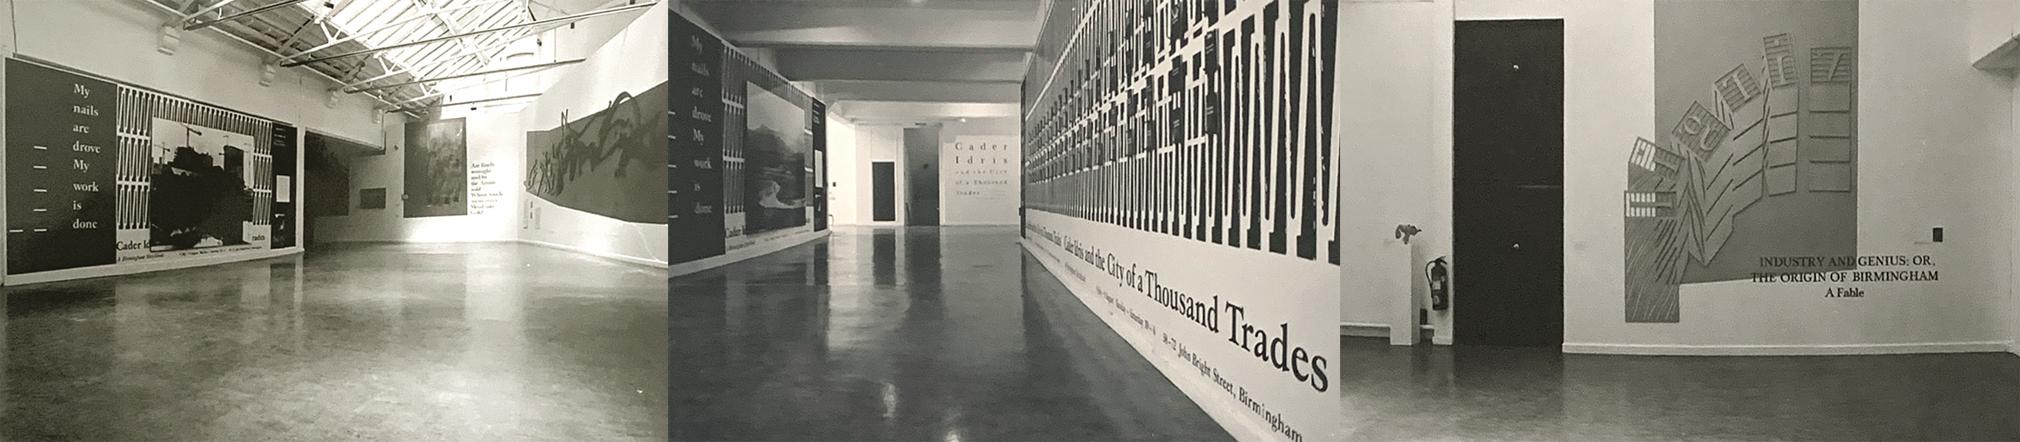 Ikon Gallery 1989